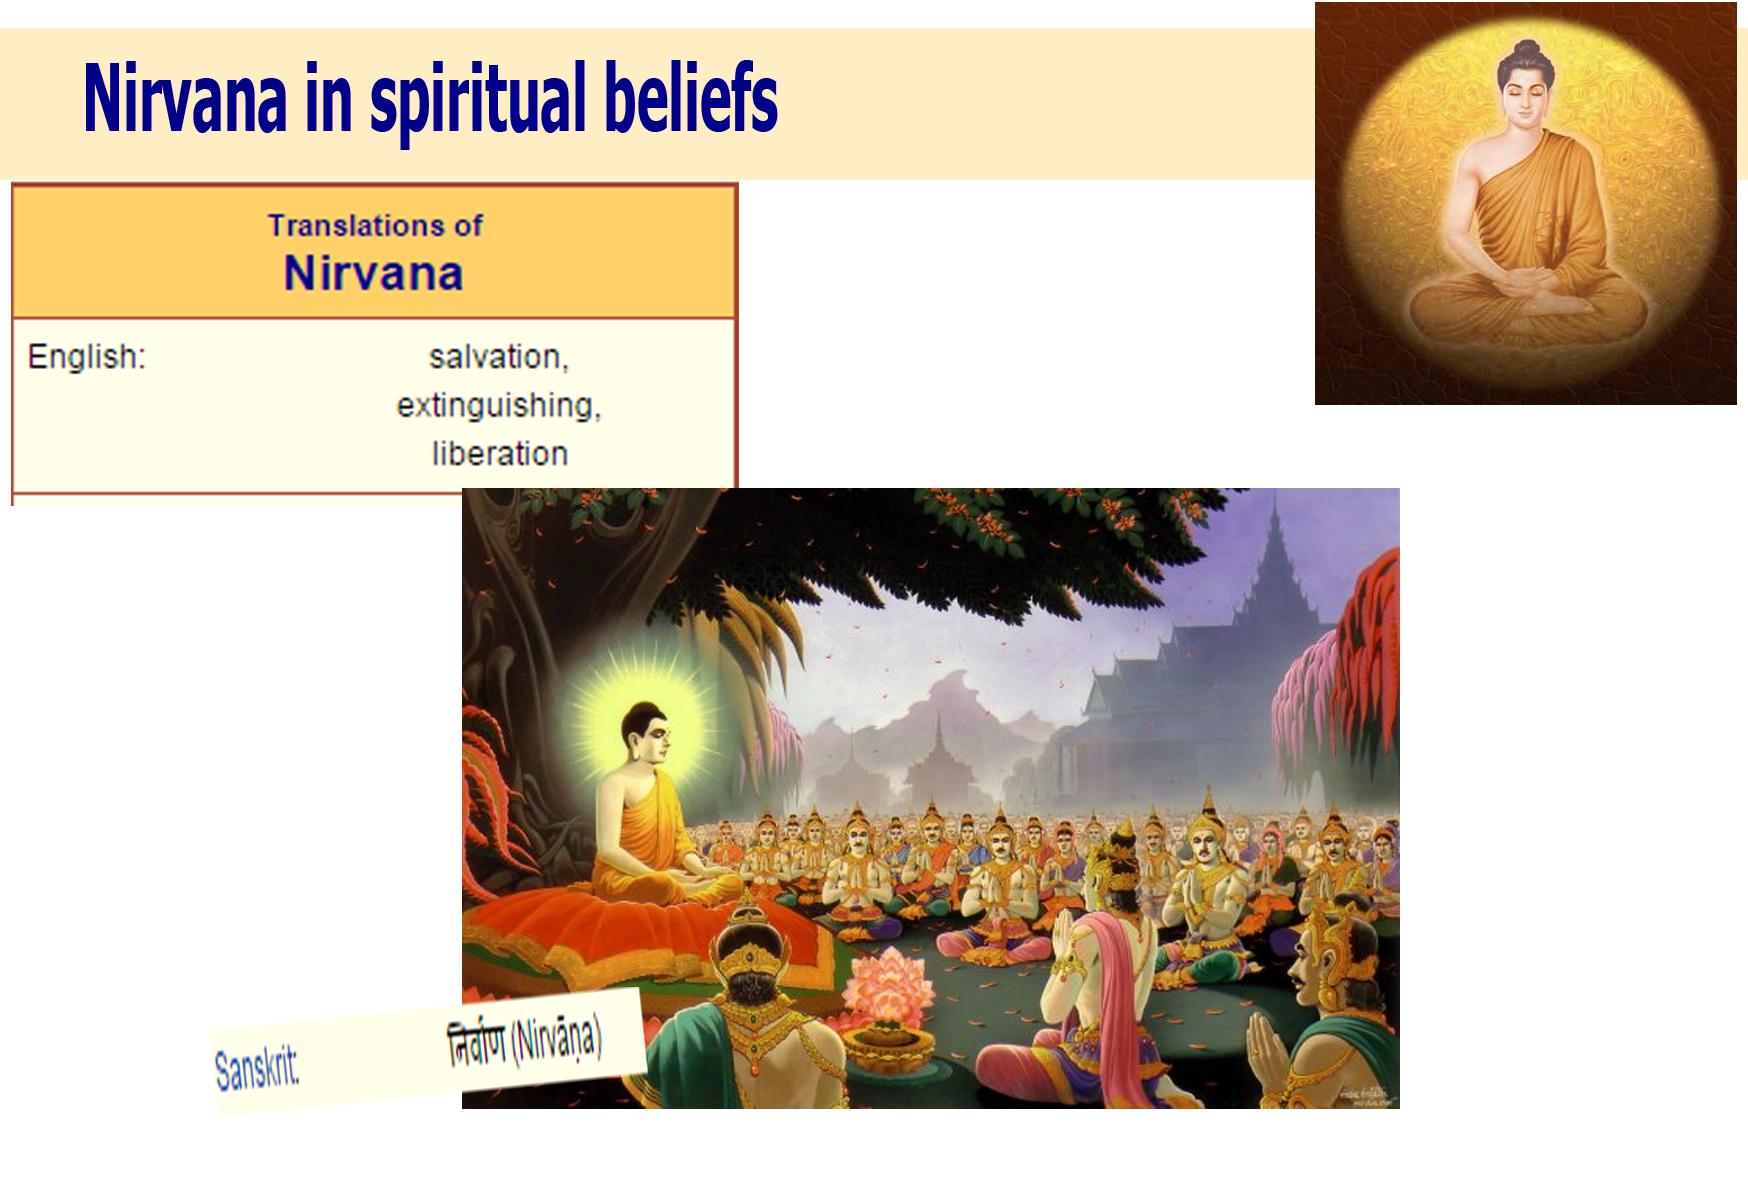 Nirvana in spiritual beliefs